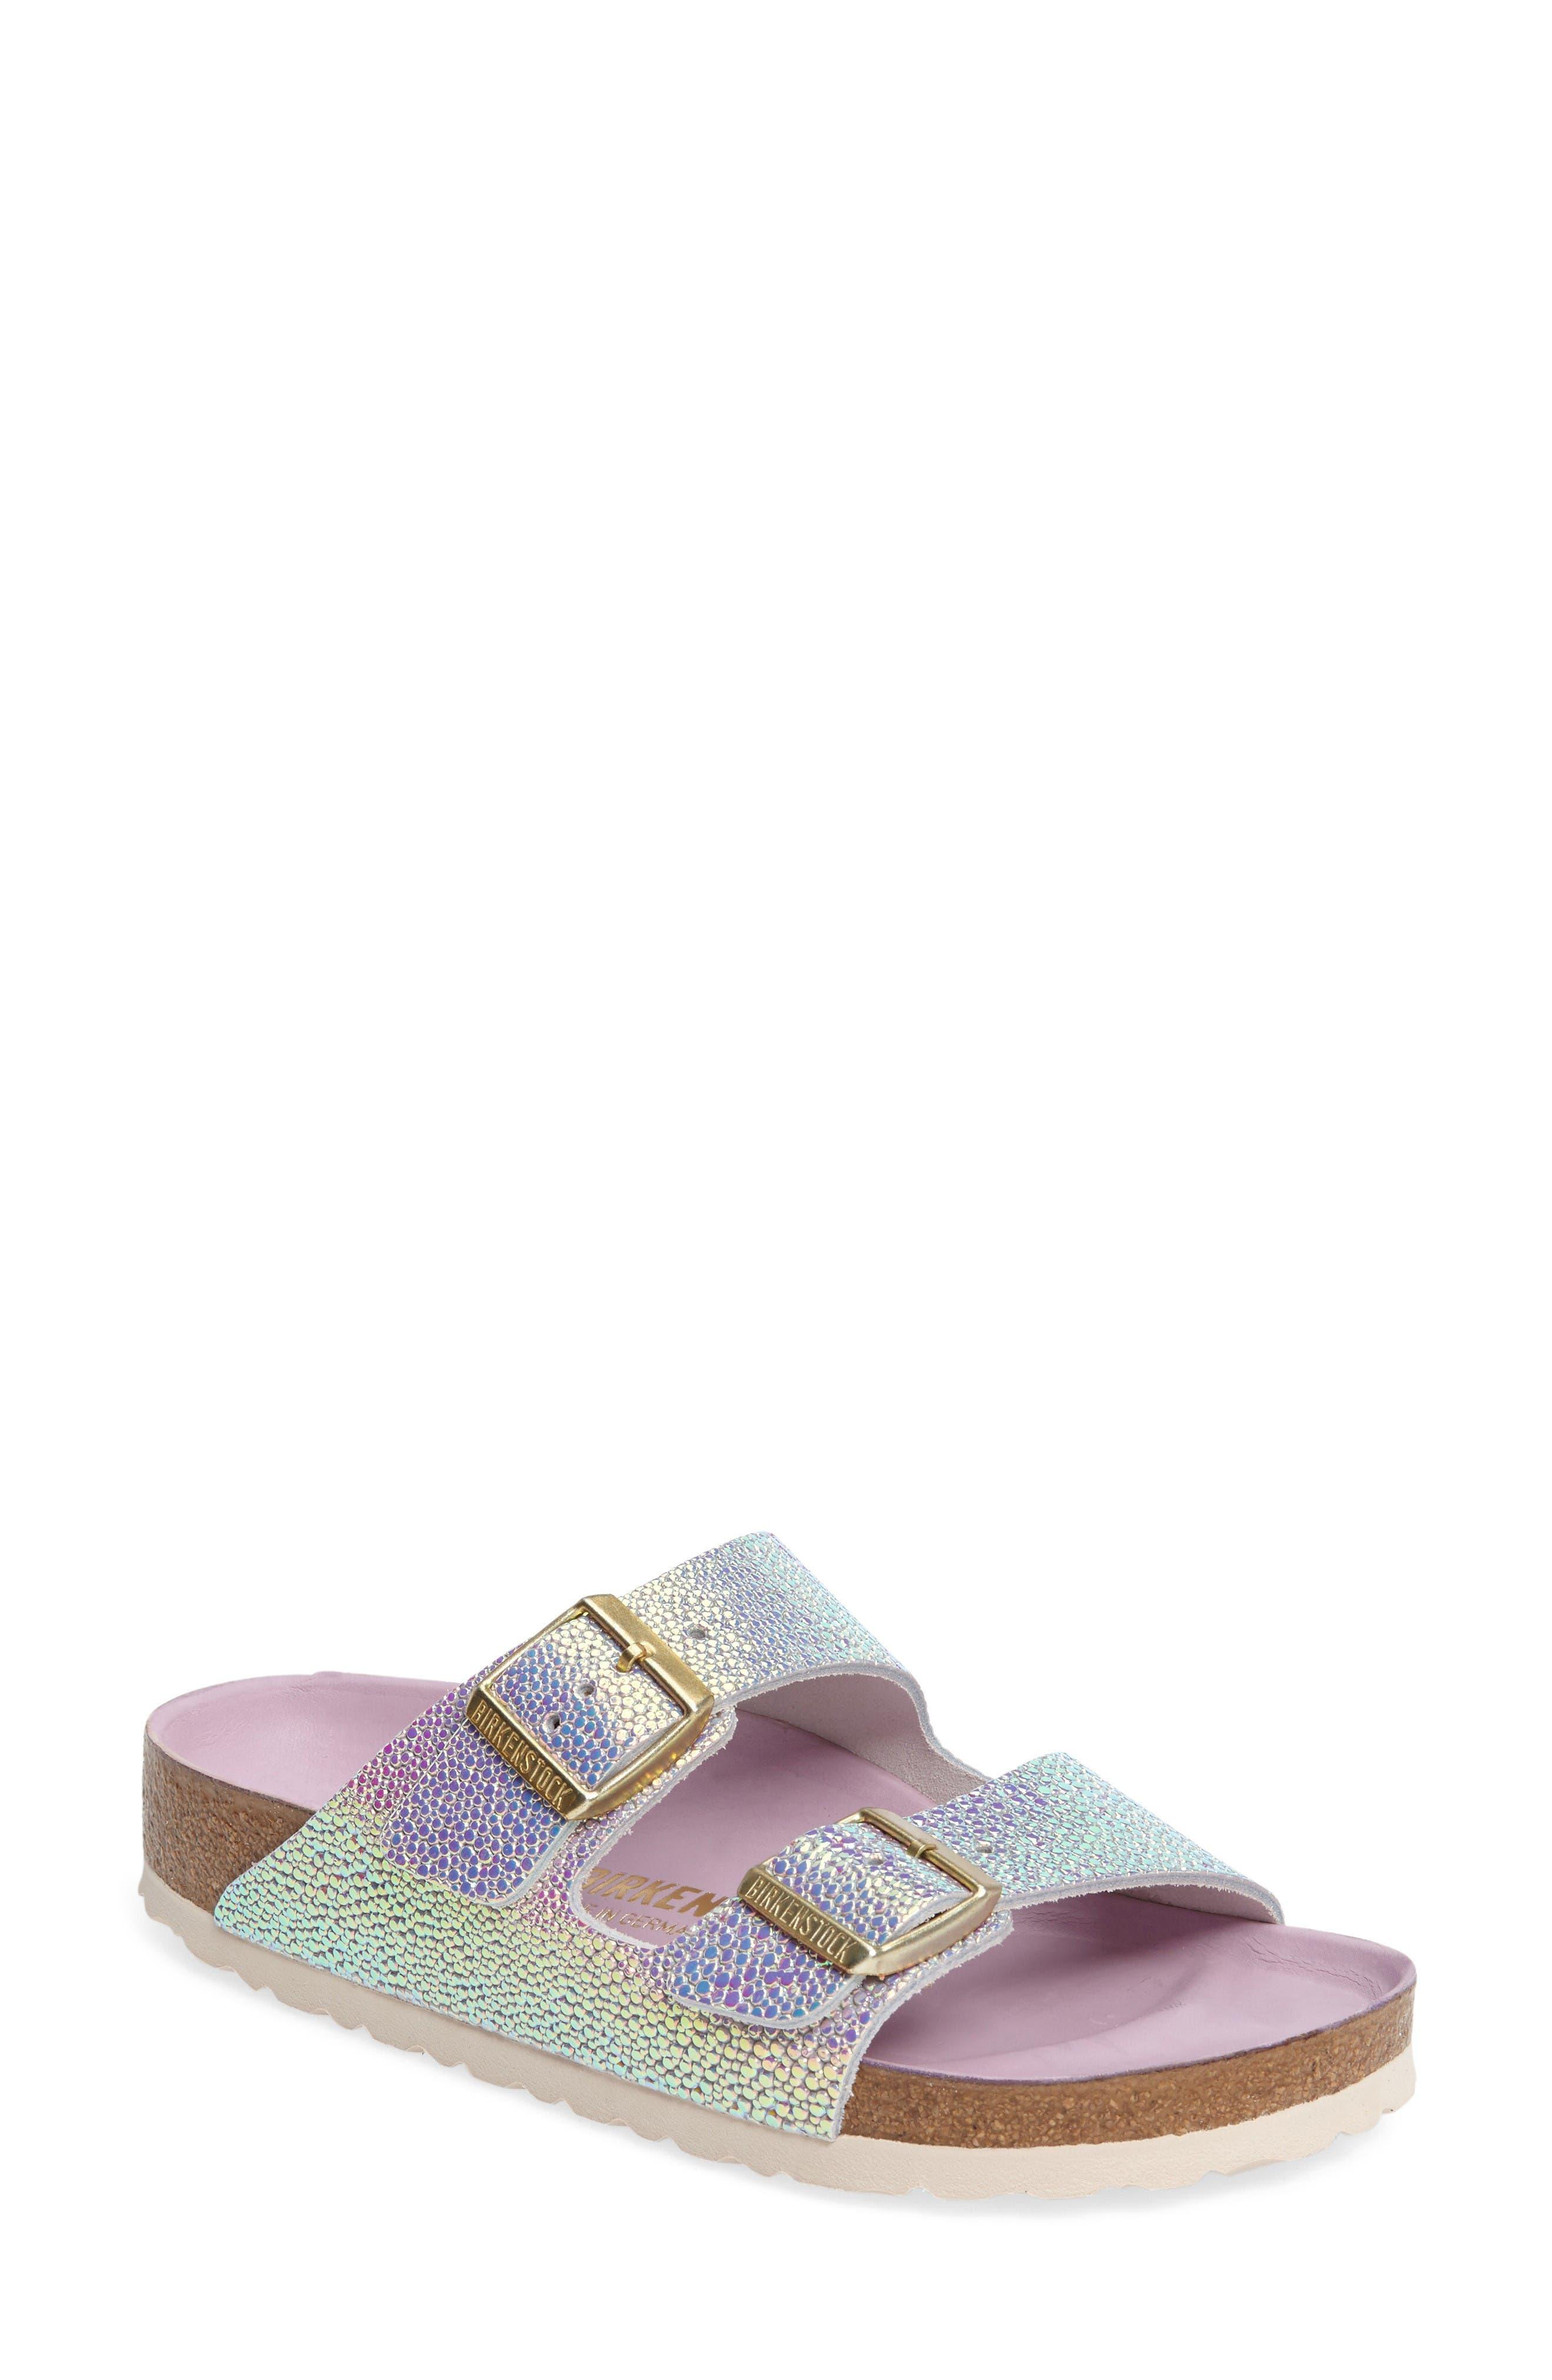 Main Image - Birkenstock Arizona Lux Iridescent Slide Sandal (Women)